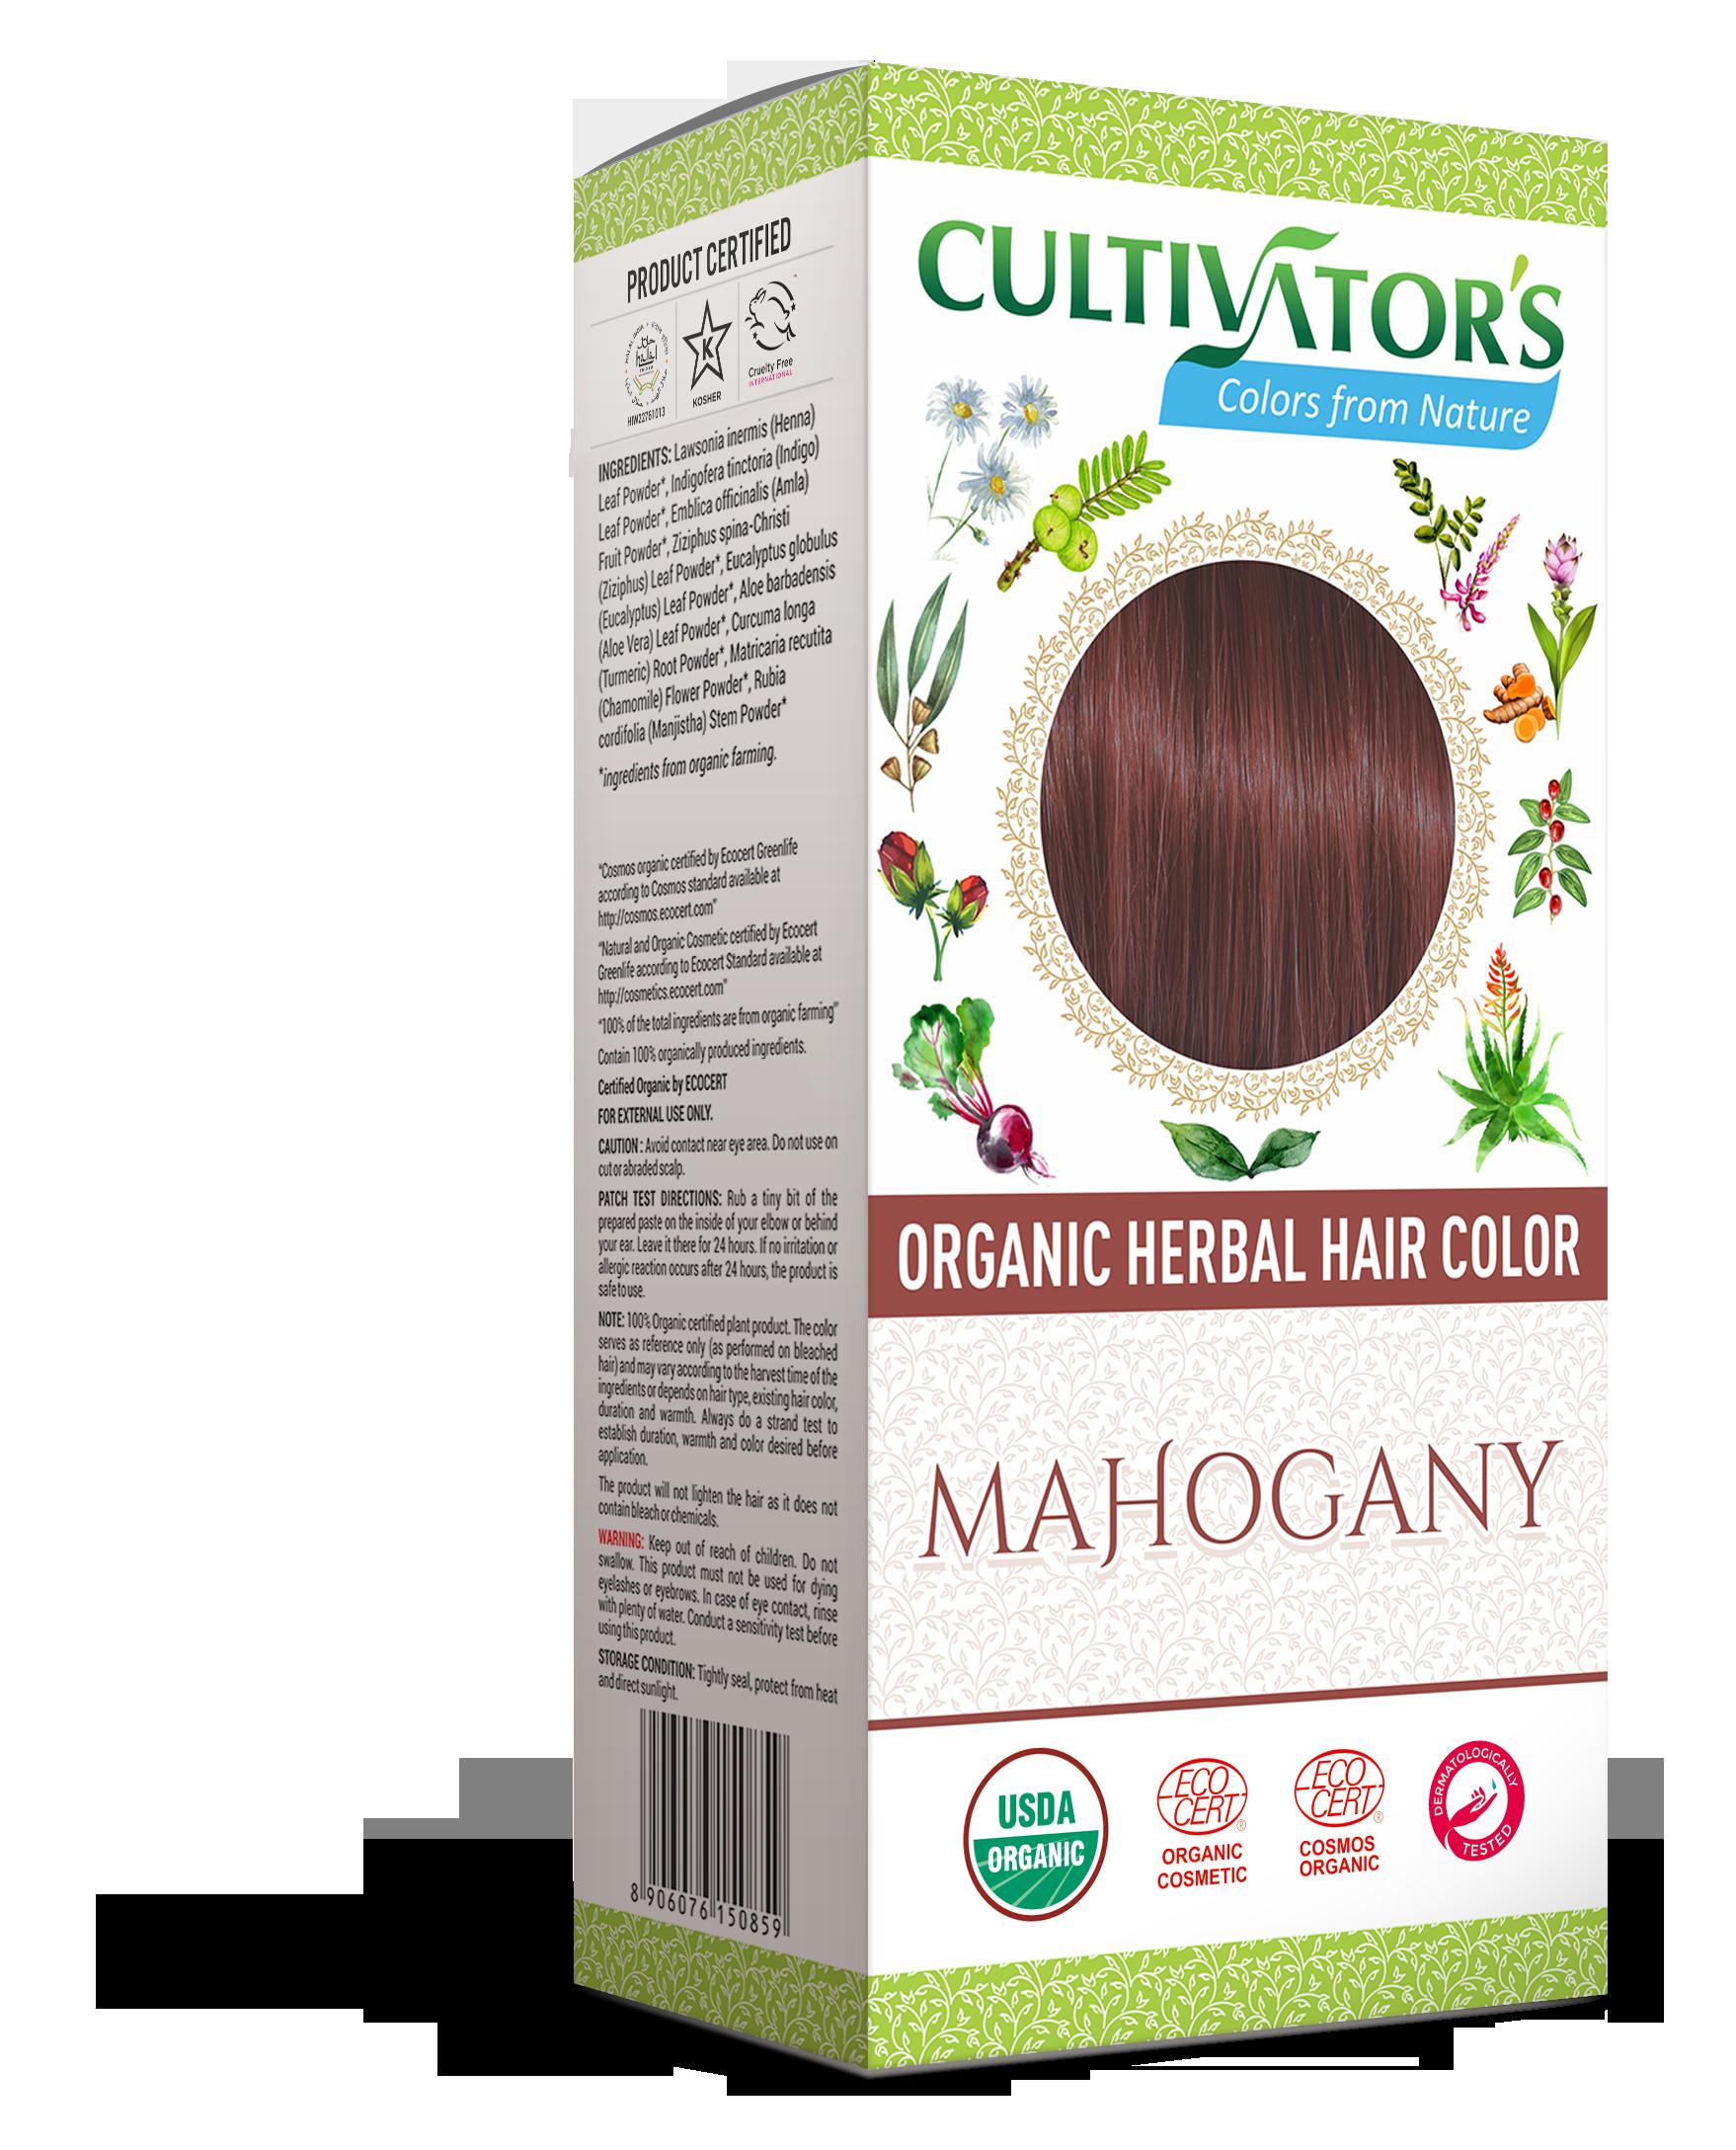 Mahogany Organic Organic Herbal Hair Color Indigo Henna Amla Aloe Ziziphus Eucalyptus Turmeric Chamomile M Herbal Hair Colour Herbal Hair Hair Color